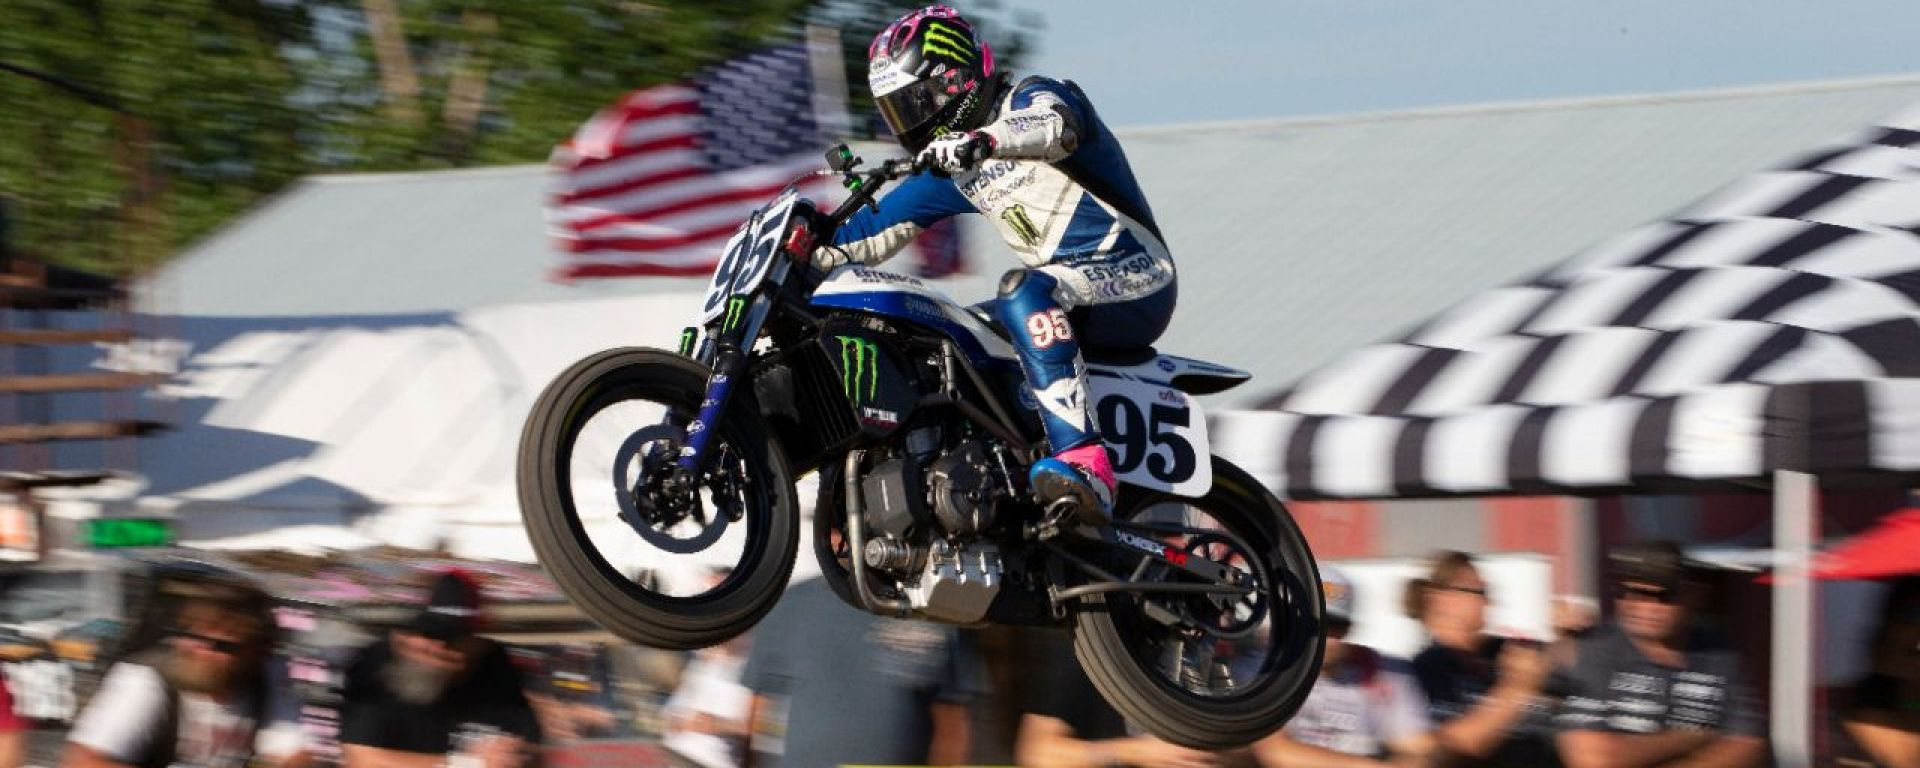 Yamaha MT-07 DT, da concept a vincitrice nelle gare di Flat Track